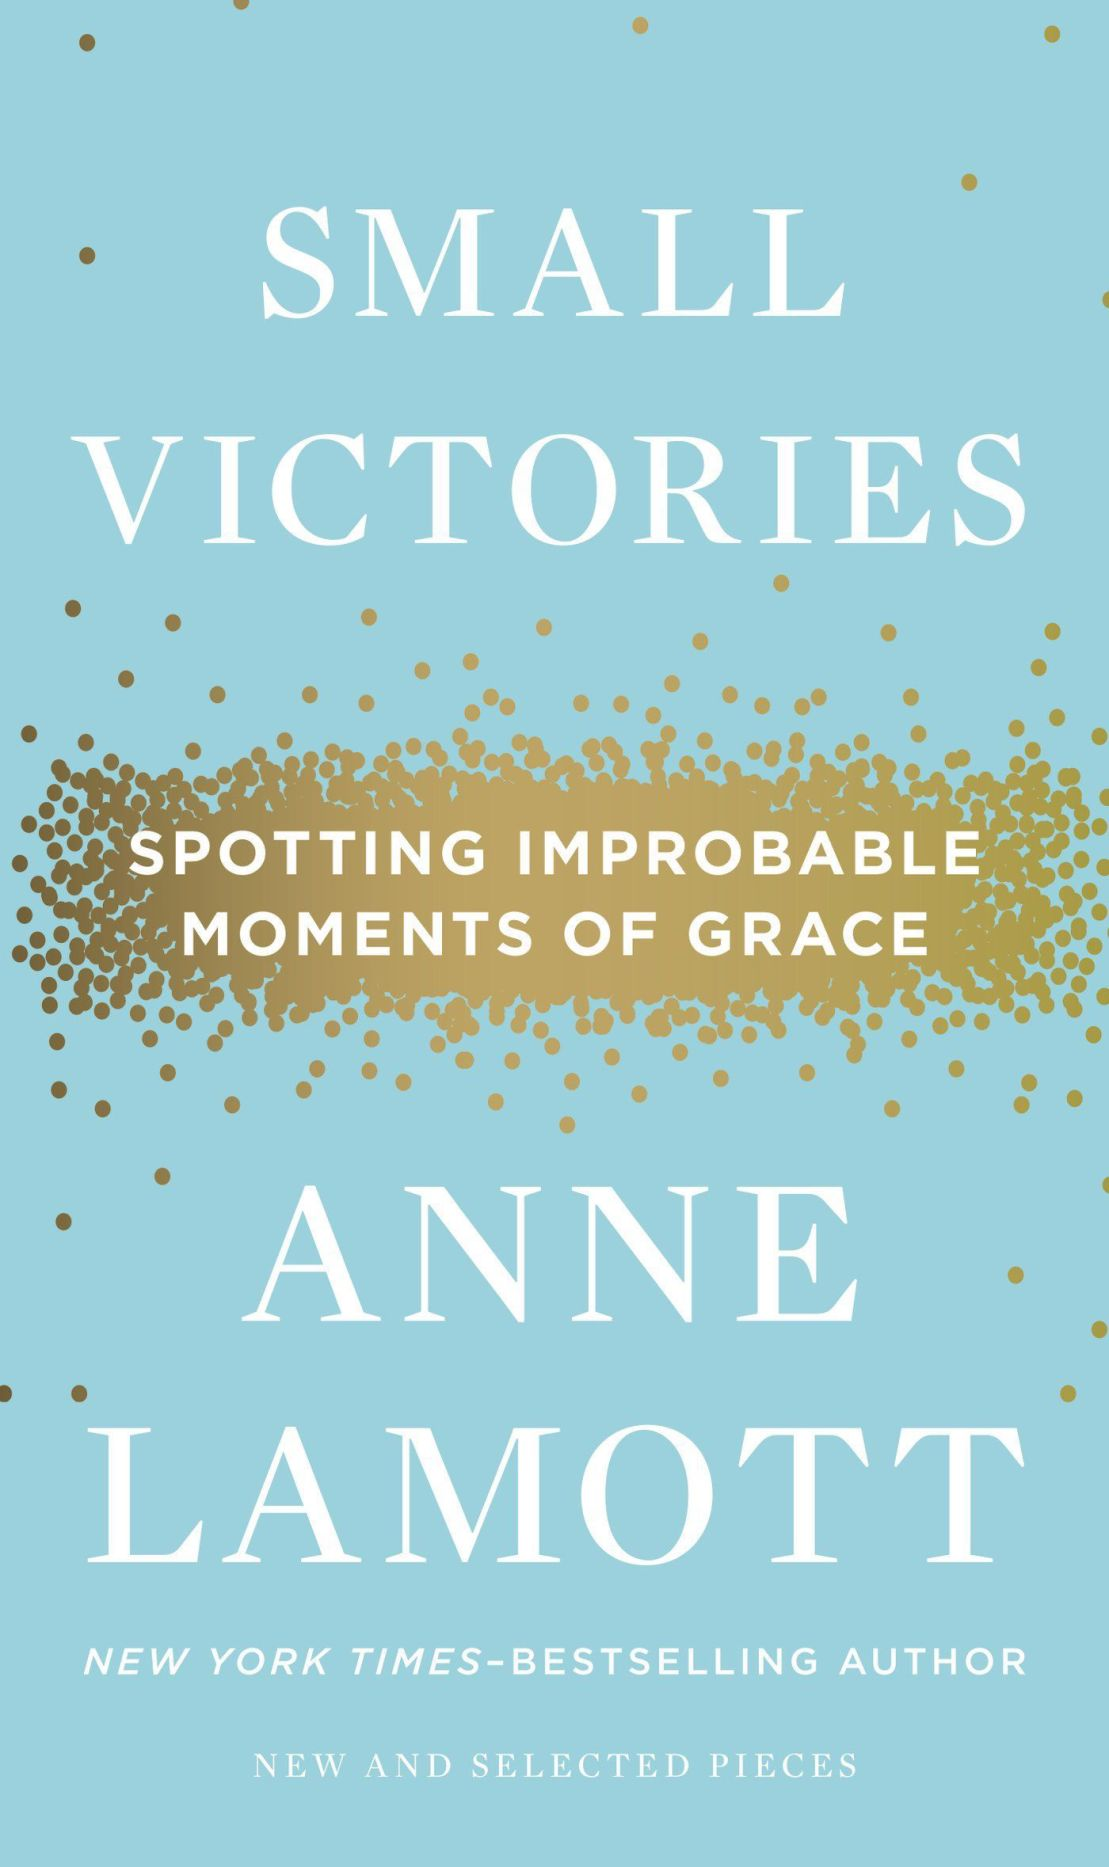 Lamott essays display wit, wisdom